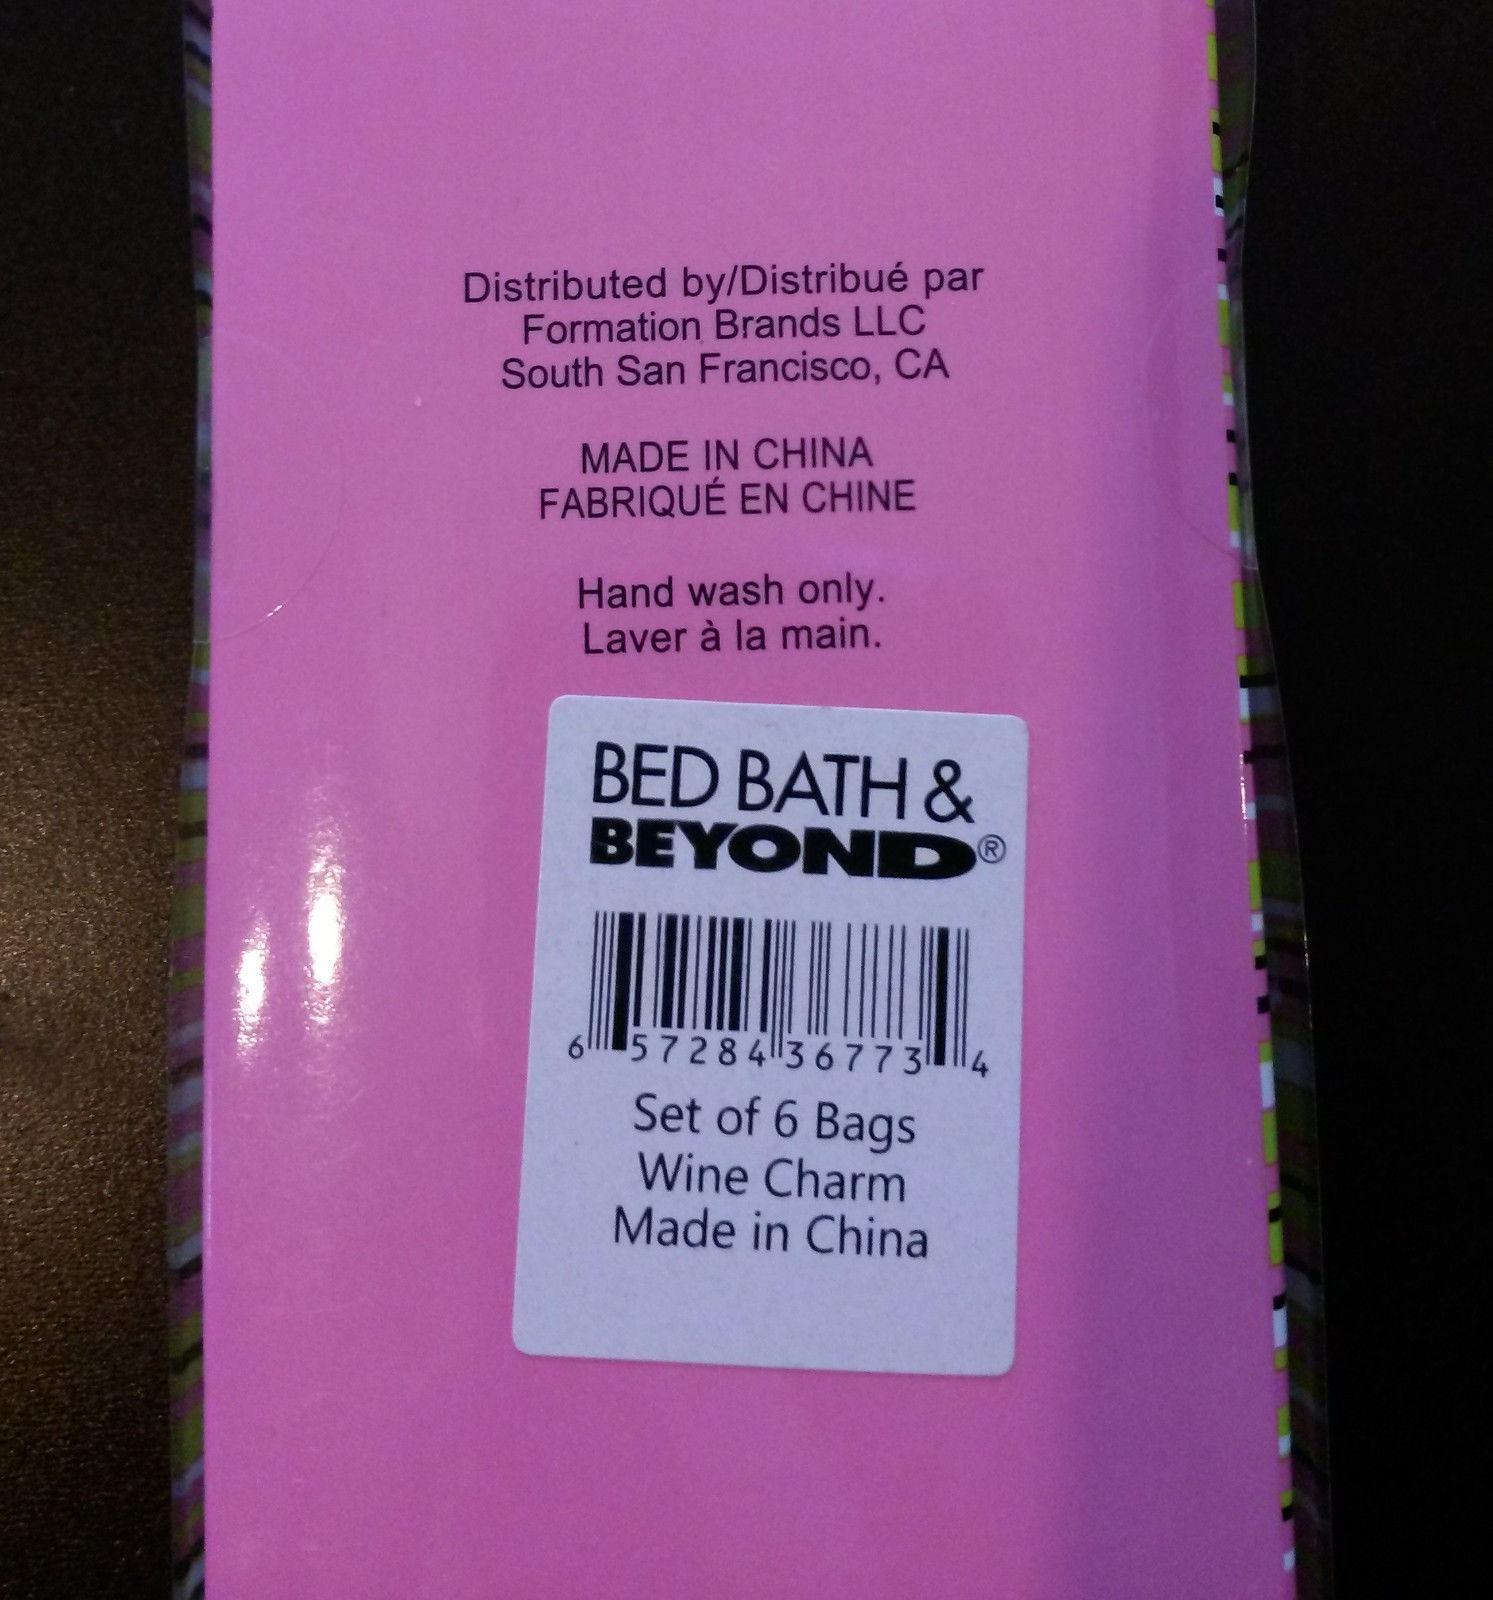 WINE GLASS CHARMS Box of 6 PURSES handbags bags fashion Bed Bath & Beyond NEW